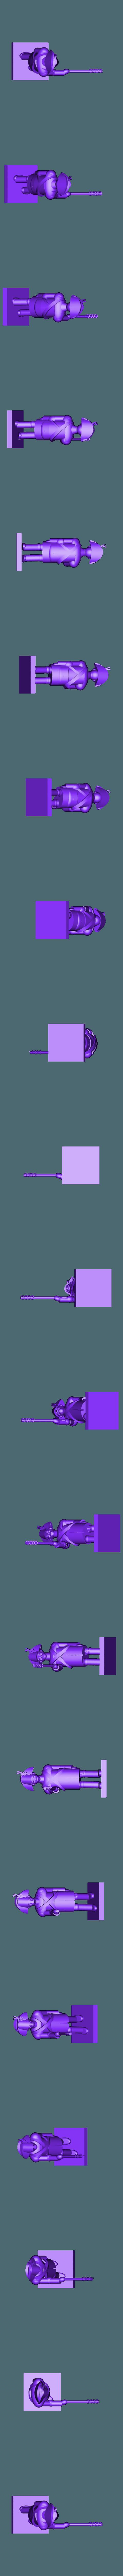 aus_art_man3.stl Download free STL file Napoleonics - Part 14 - Austrian Gun Crew • 3D printing design, Earsling